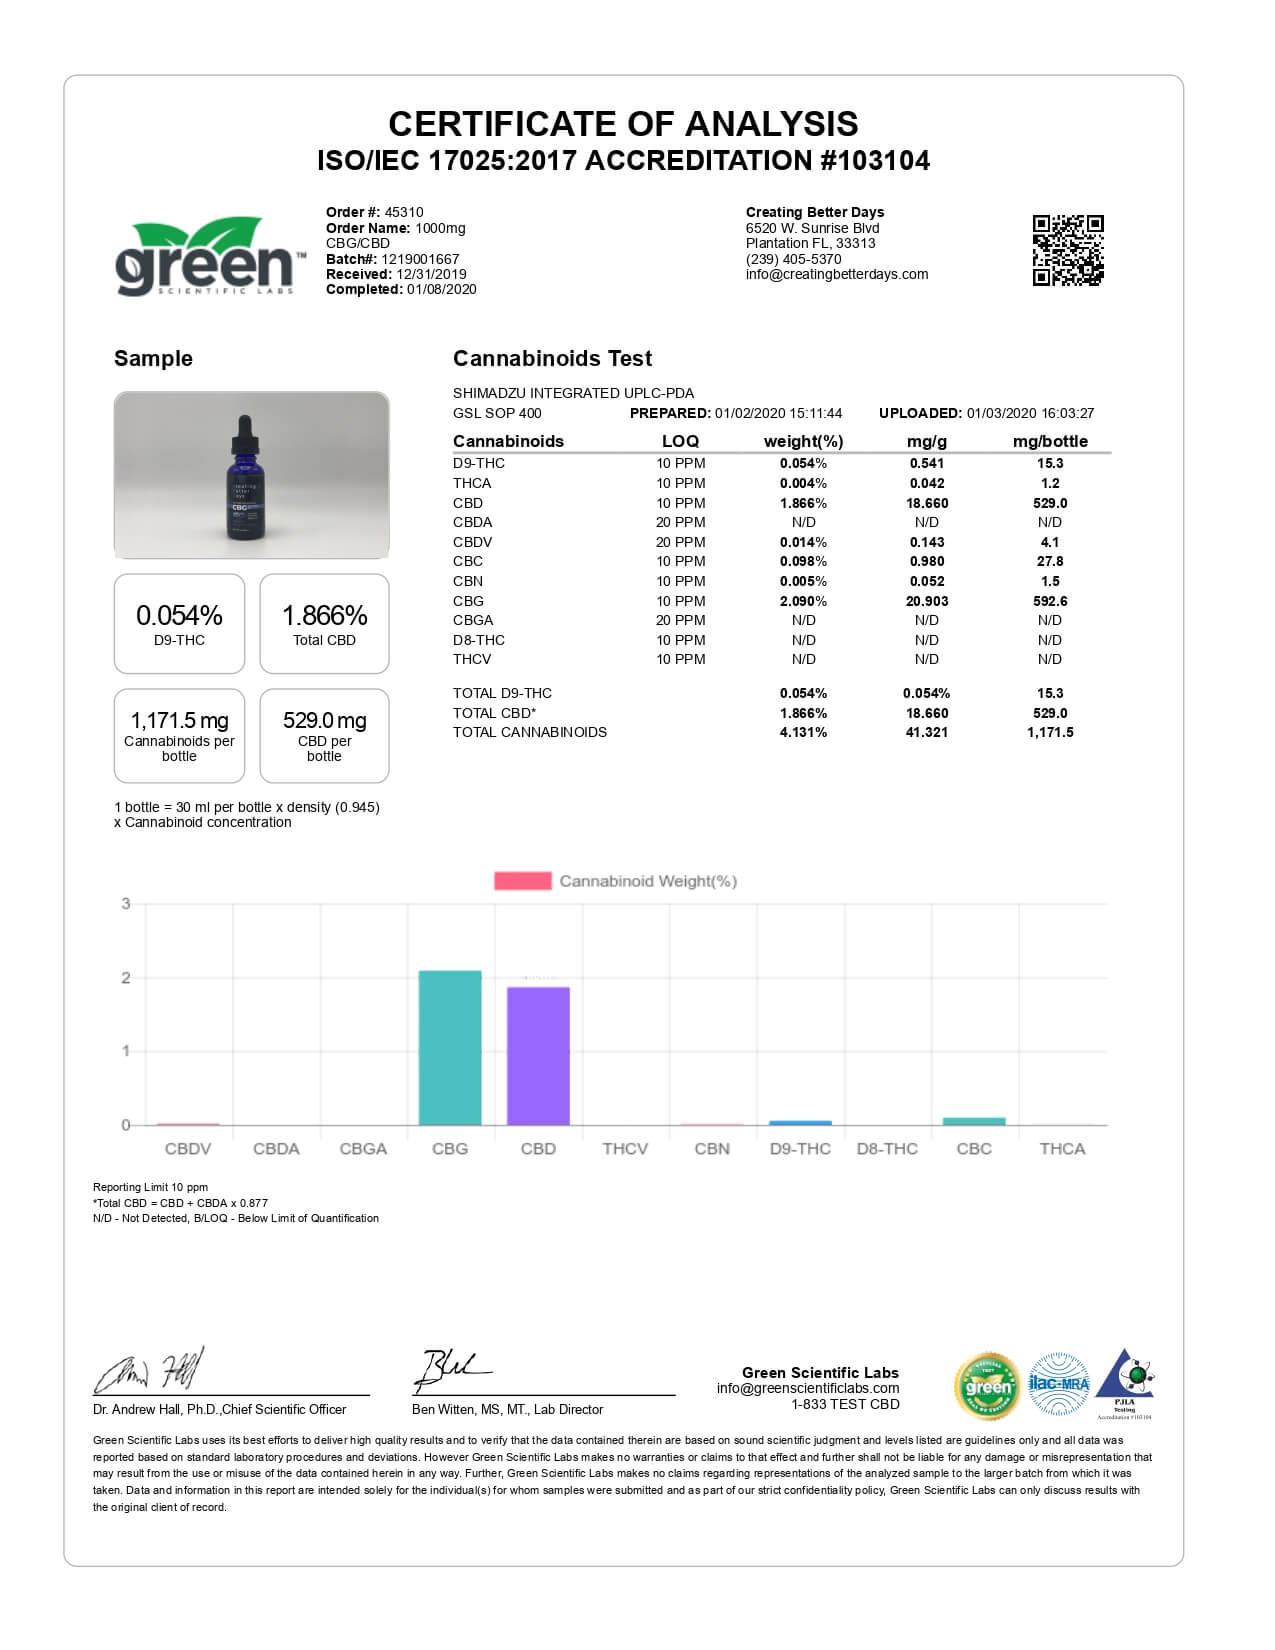 Creating Better Days CBD Tincture 1:1 Ratio CBD+CBG 1000mg Lab Report